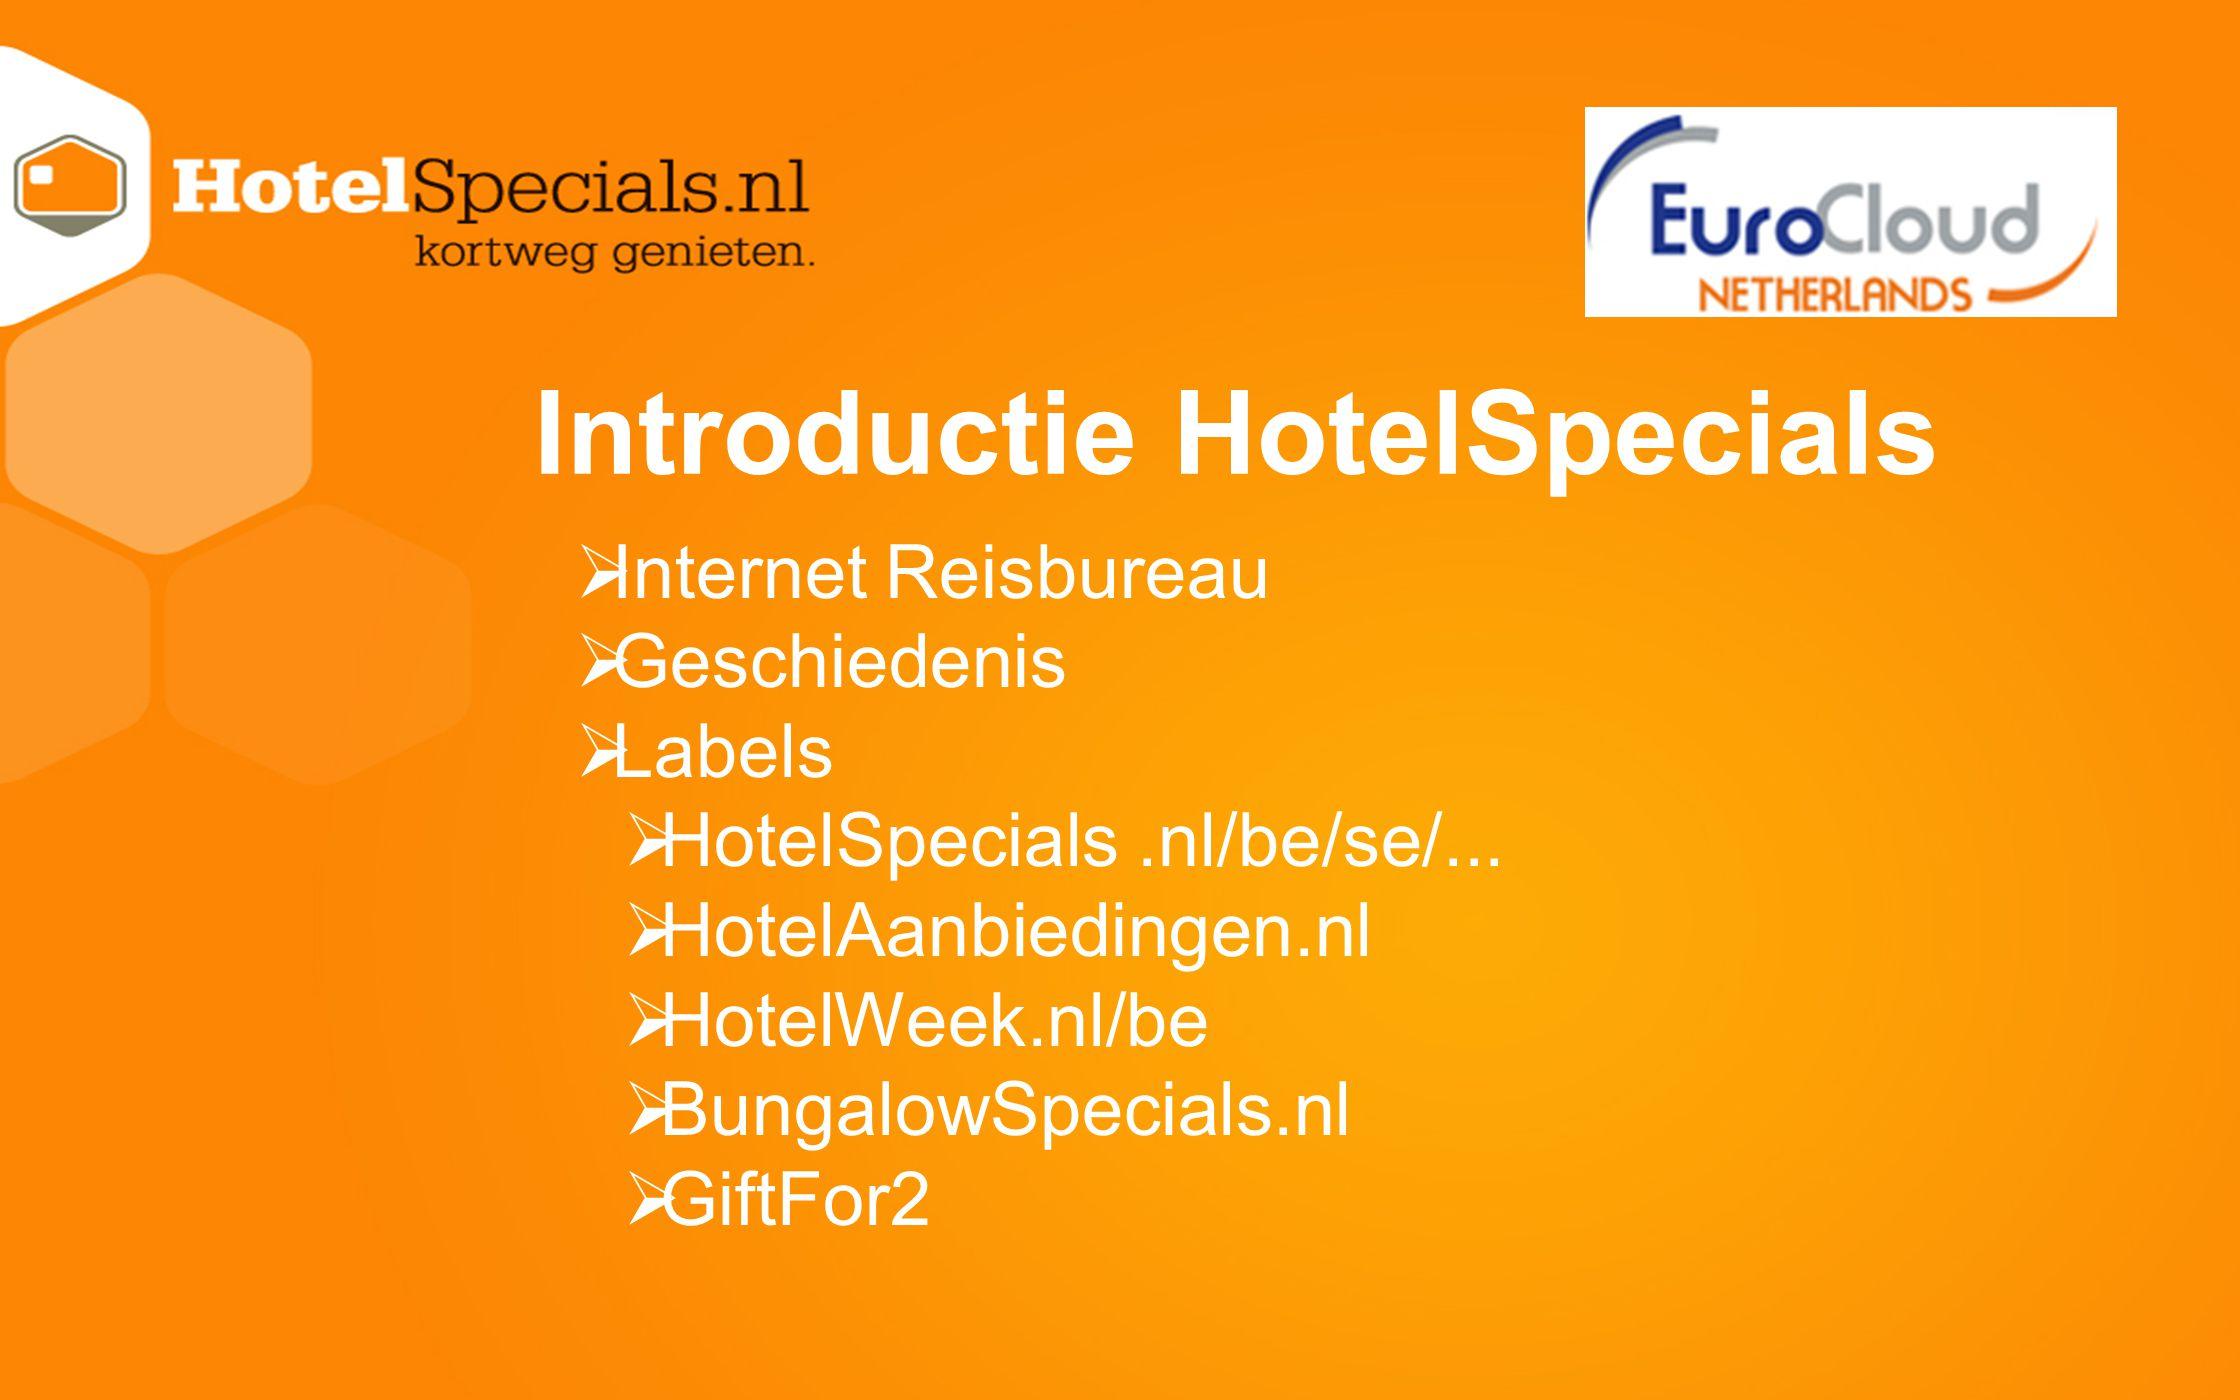 Introductie HotelSpecials  Internet Reisbureau  Geschiedenis  Labels  HotelSpecials.nl/be/se/...